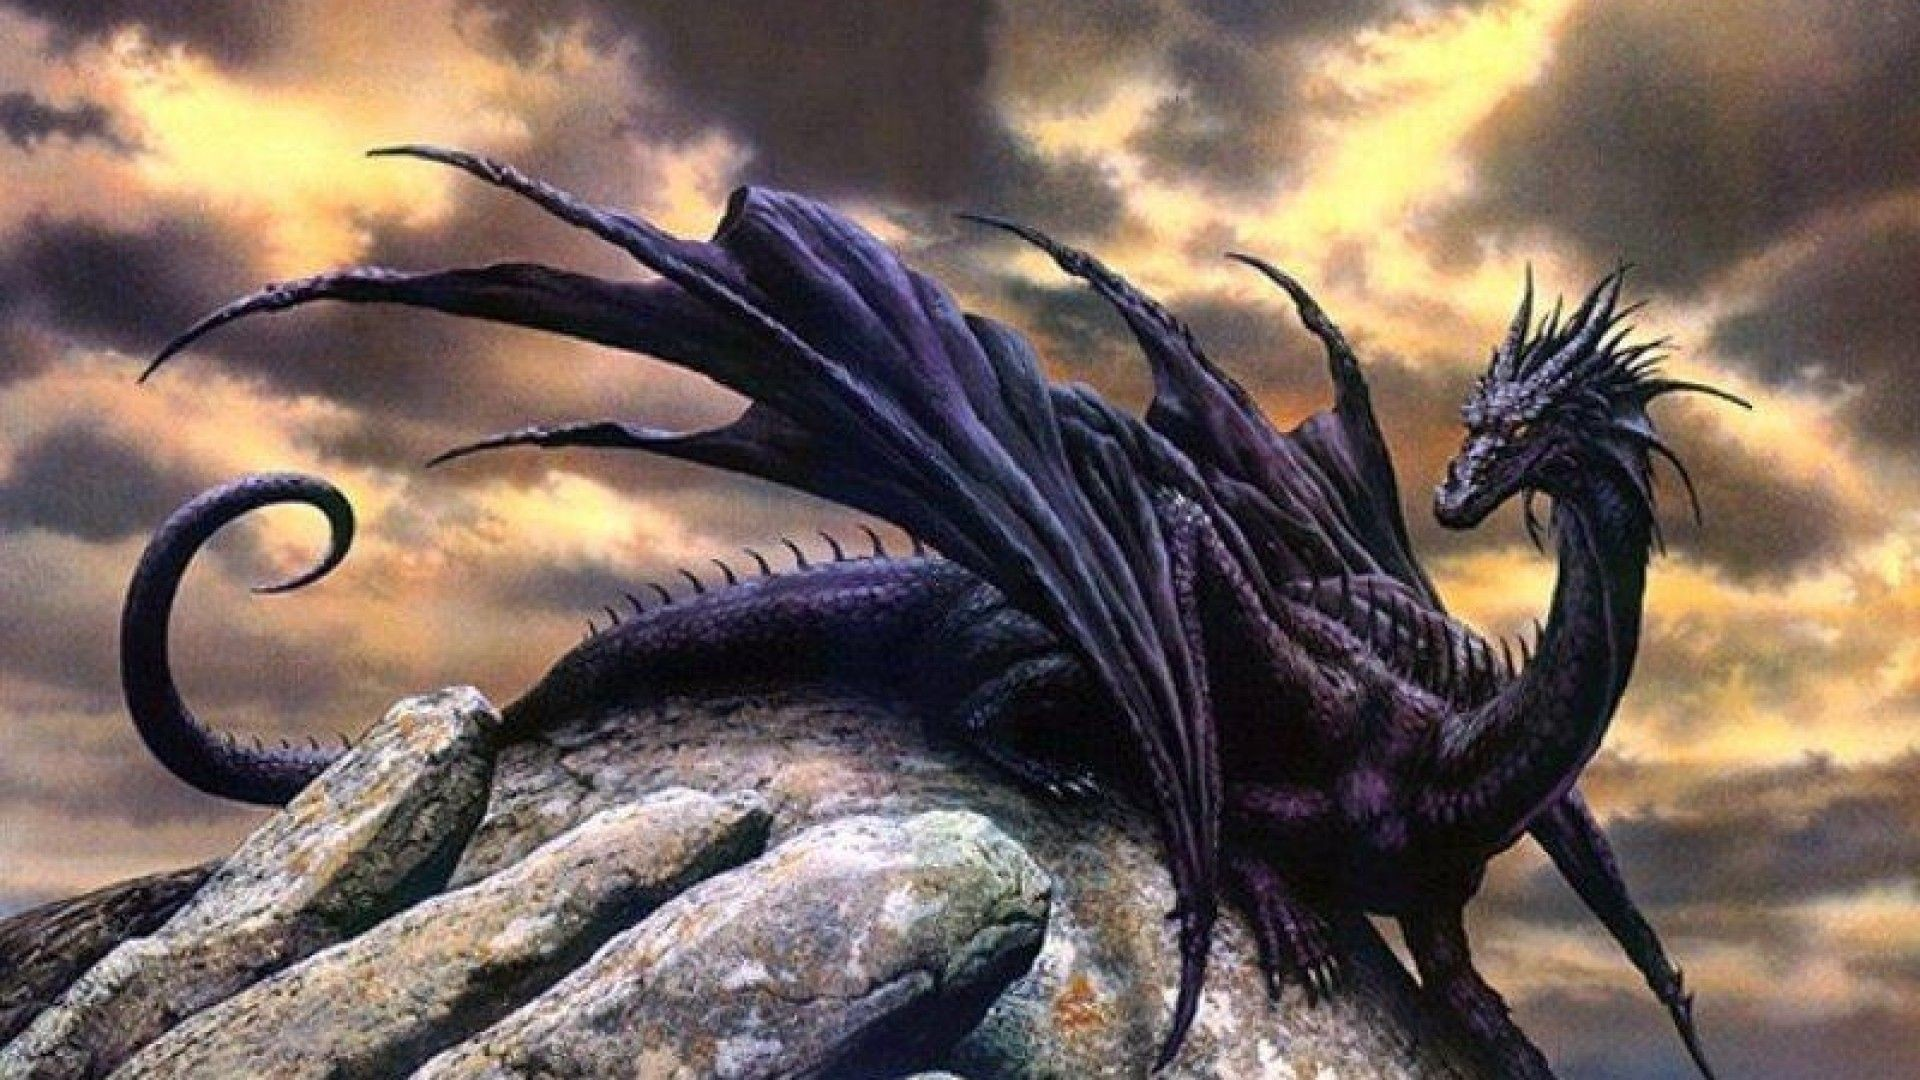 Dragon Wallpaper 1080p (79+ images)